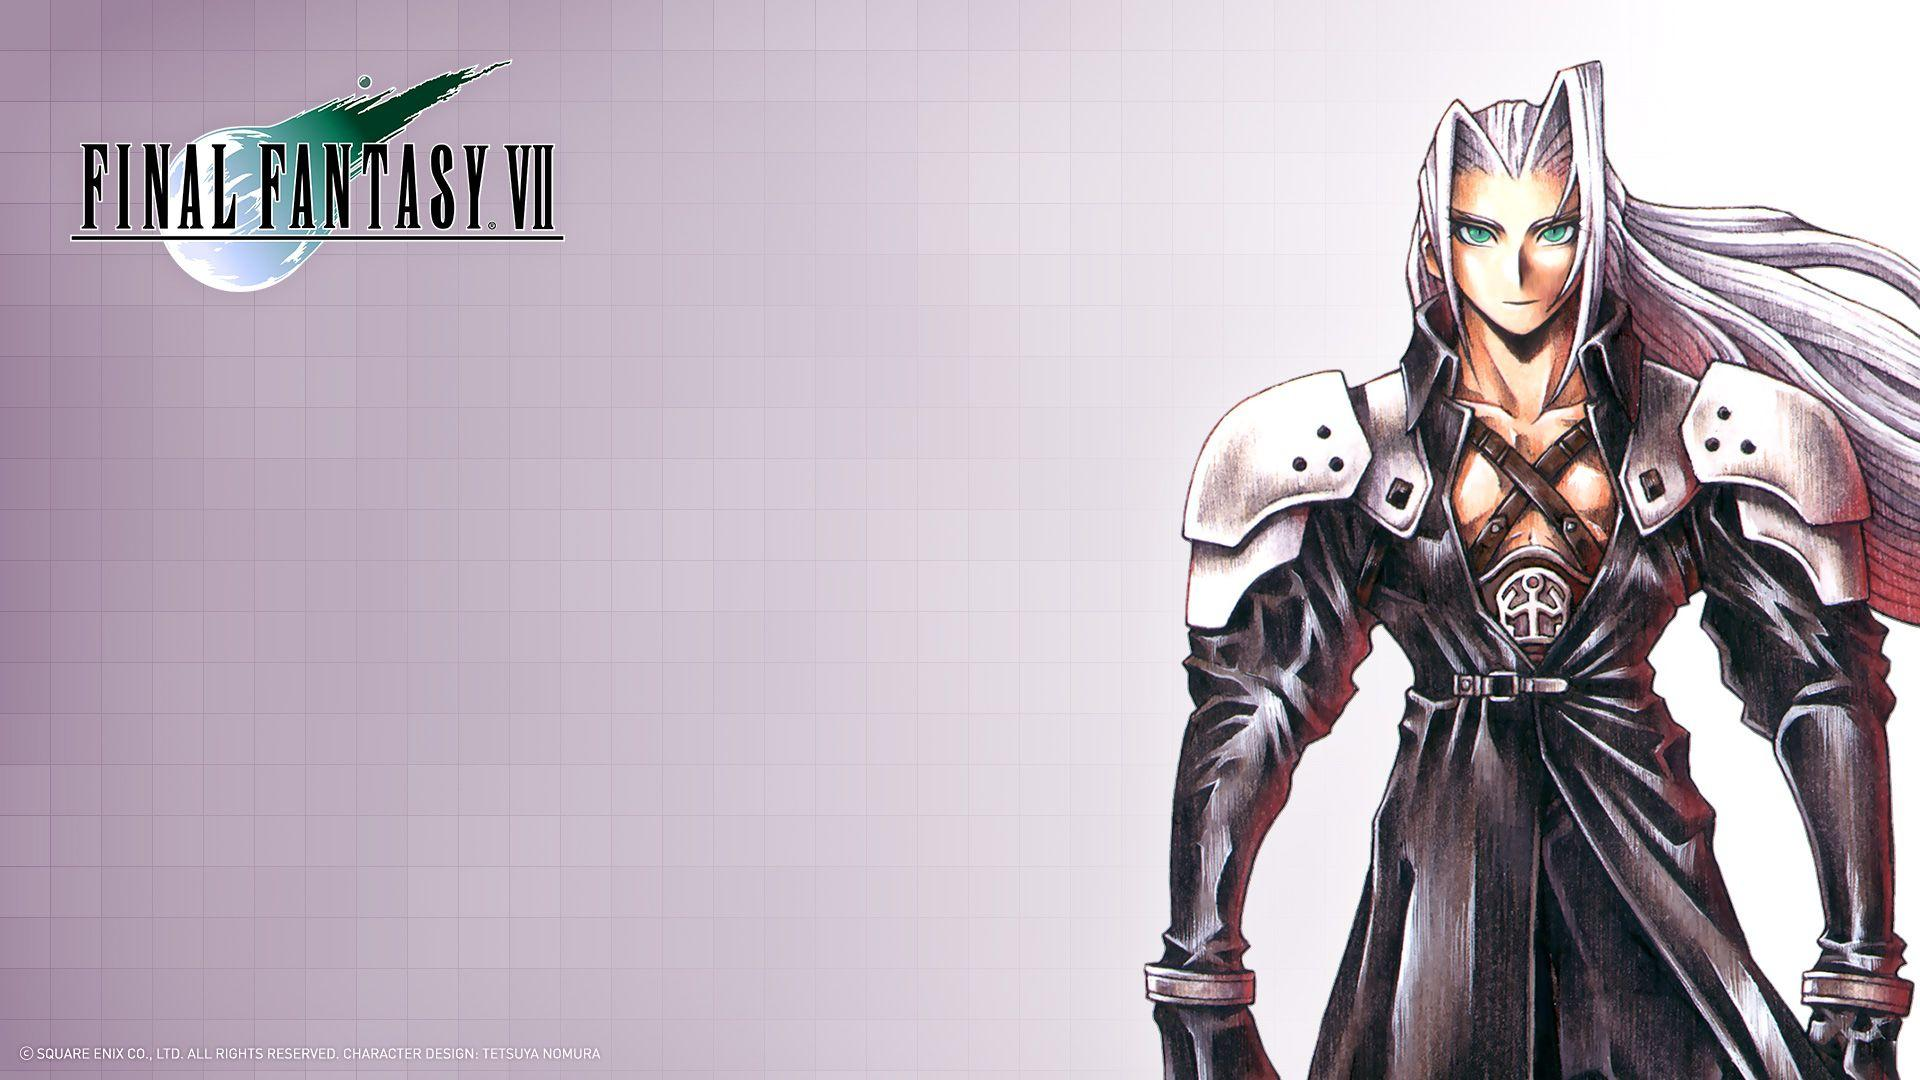 Final Fantasy 7 Sephiroth Wallpapers HD - Wallpaper Cave